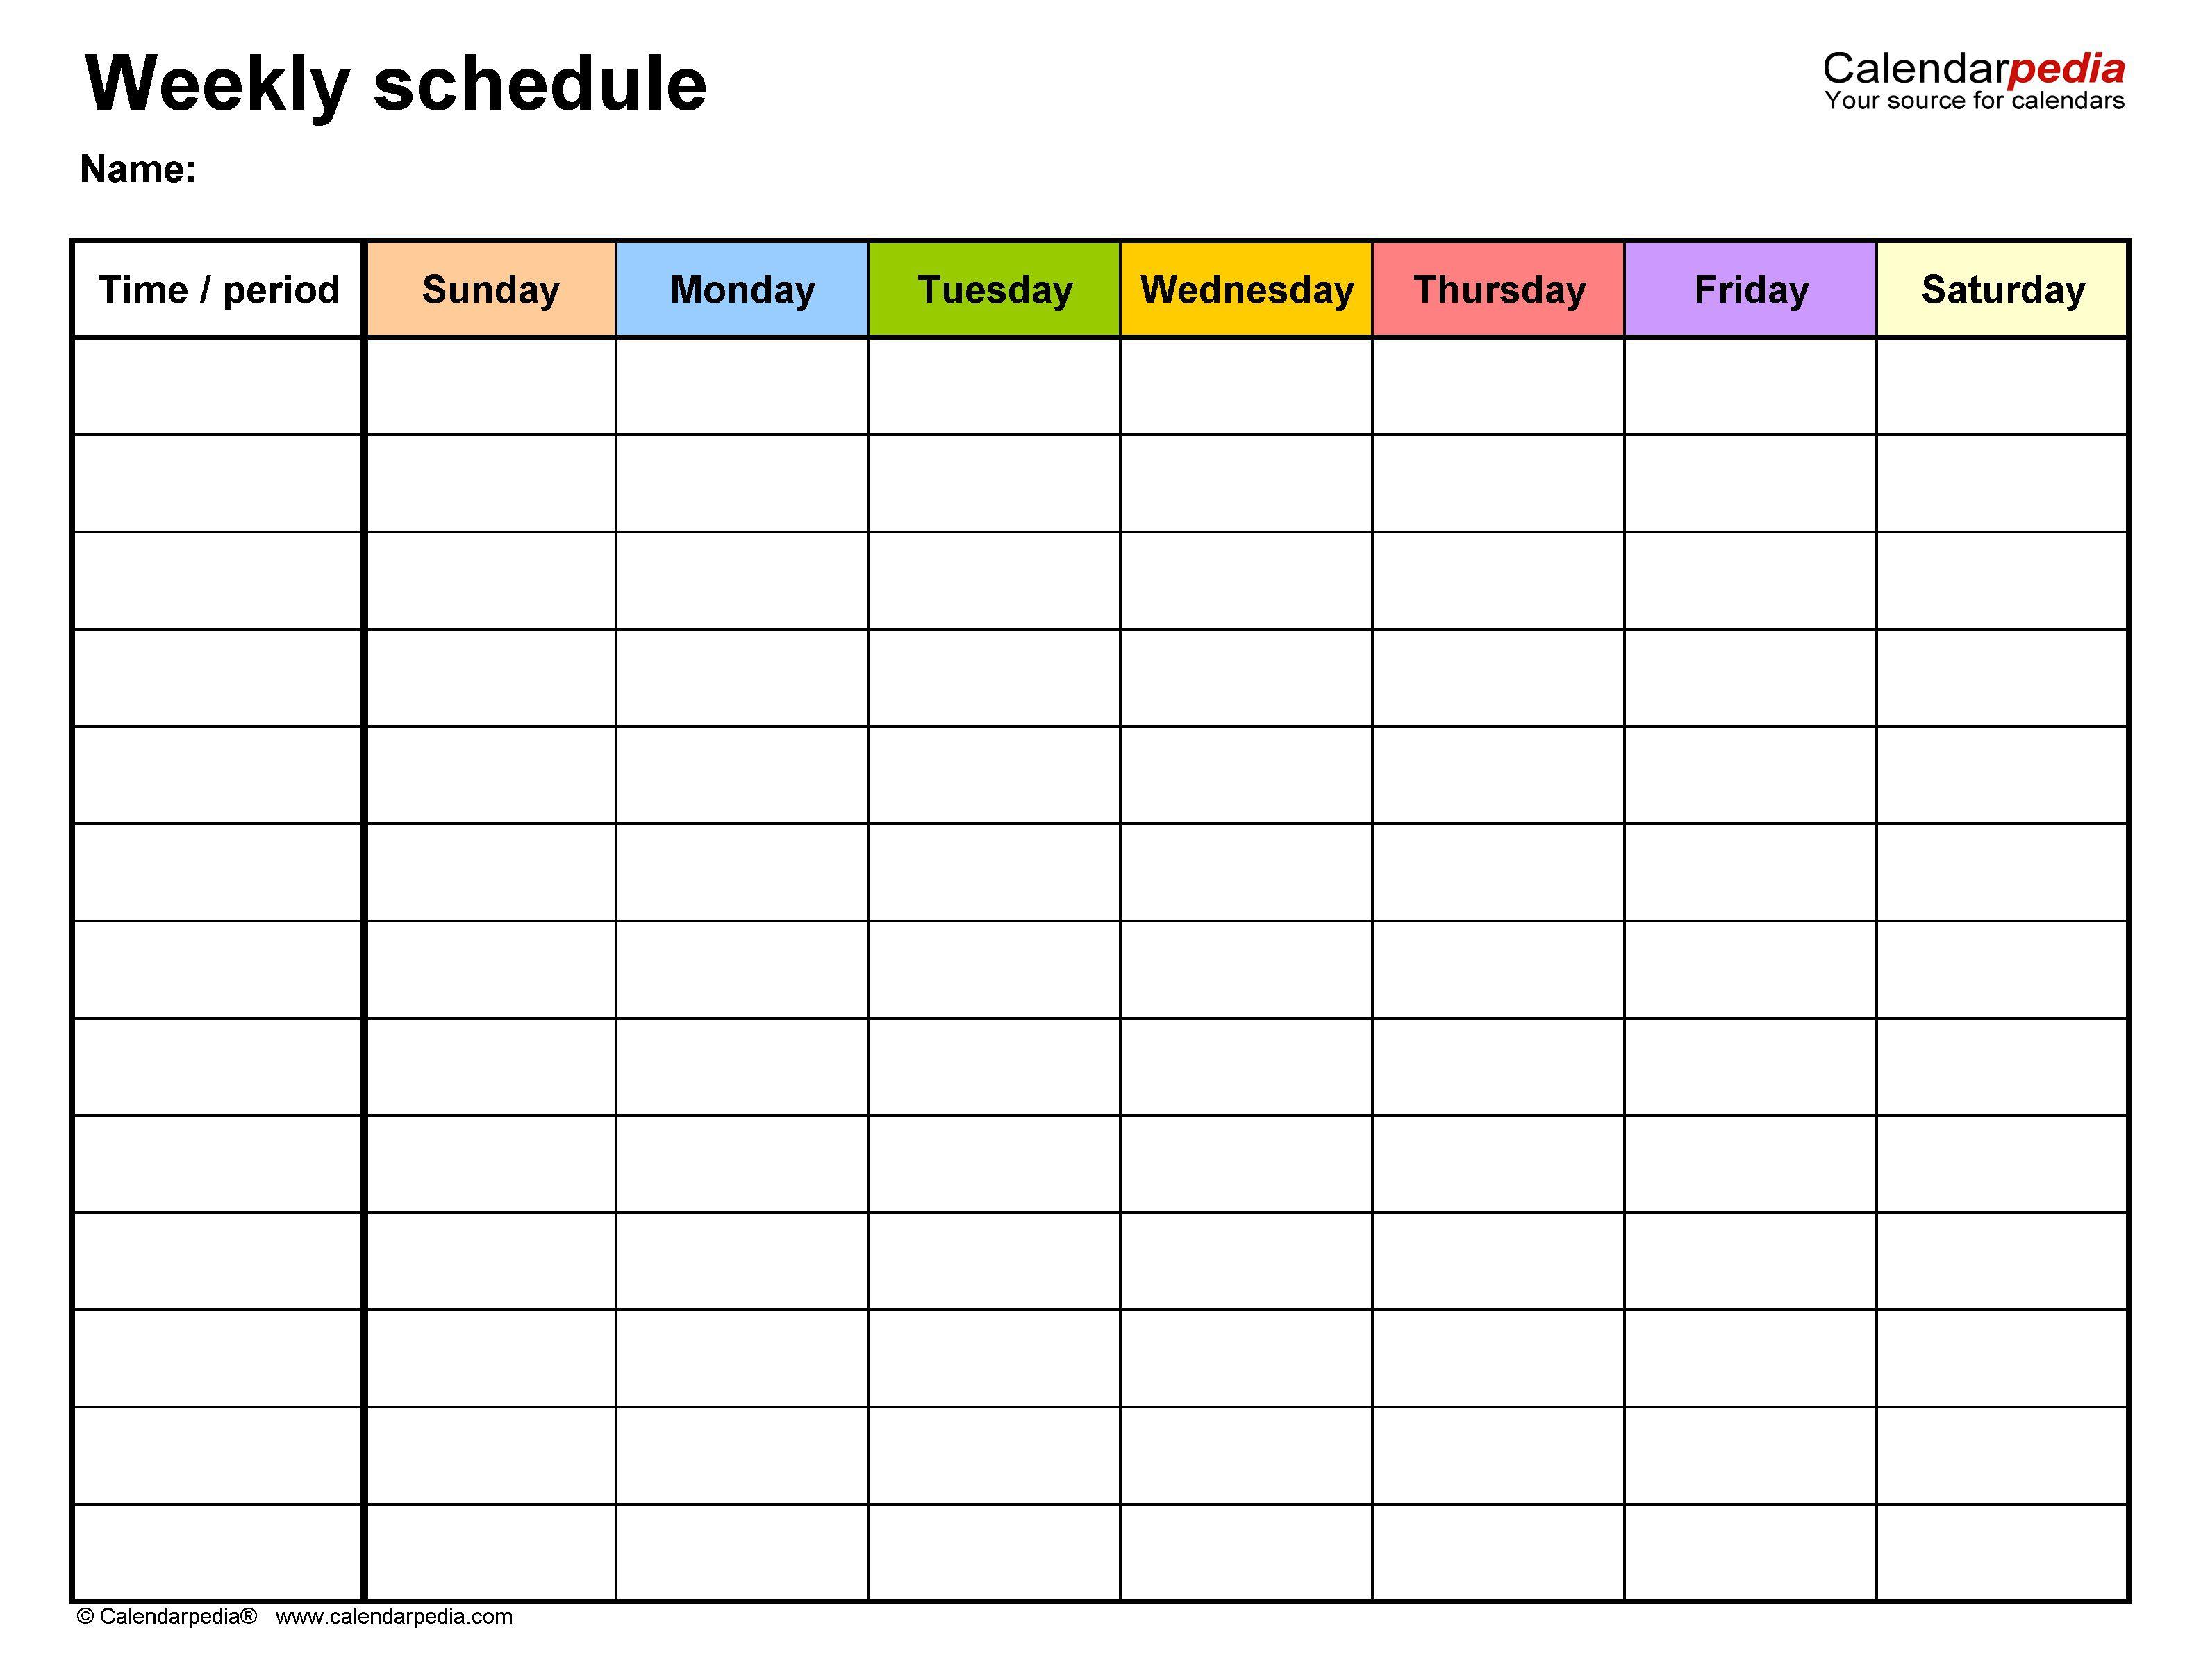 008 Rare Daily Calendar Template Excel Image Full